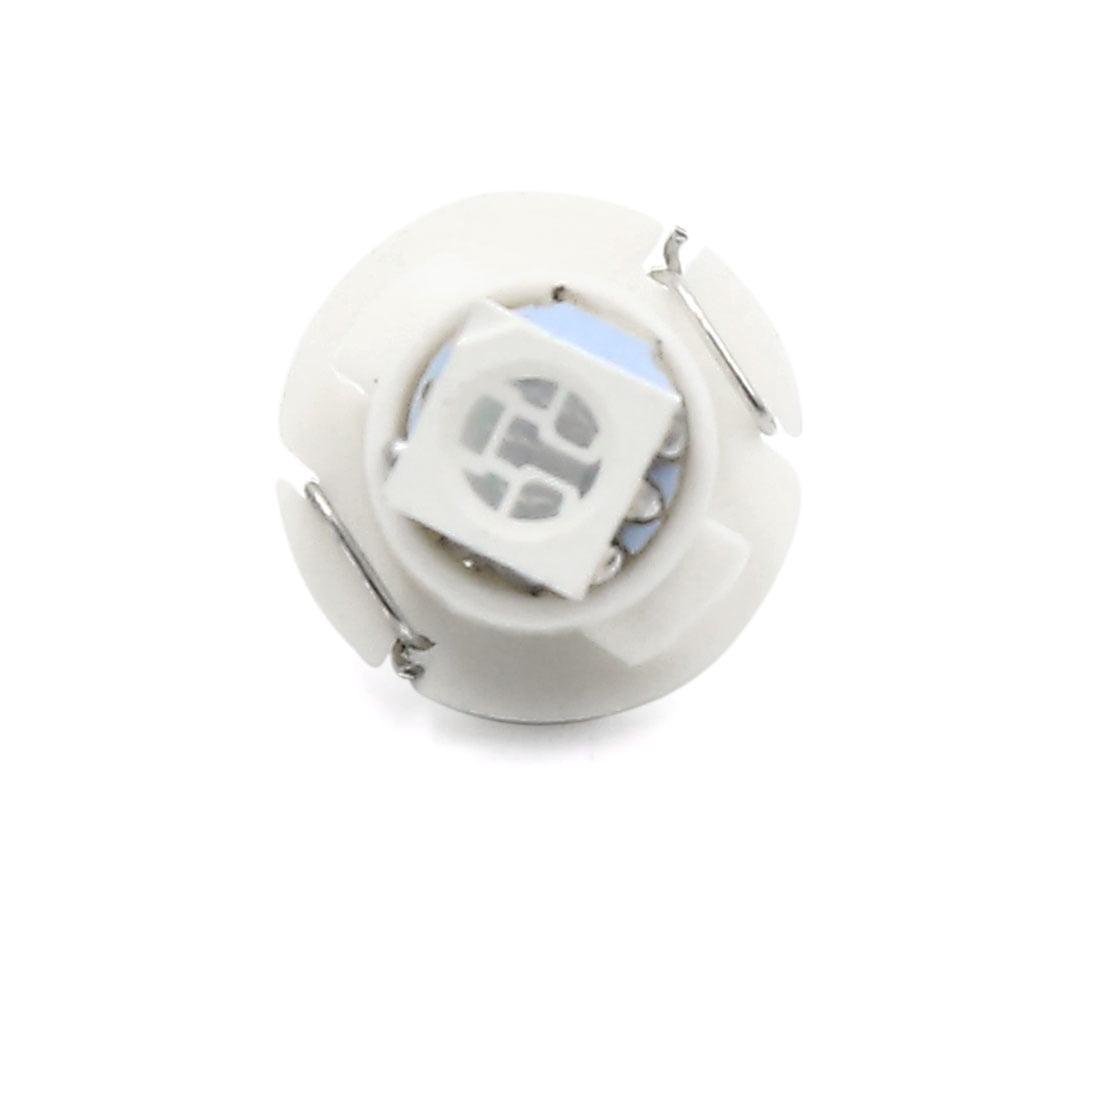 12pcs 12V T4.7 5050-SMD Green LED Auto Car Interior Dashboard Panel Light Bulb